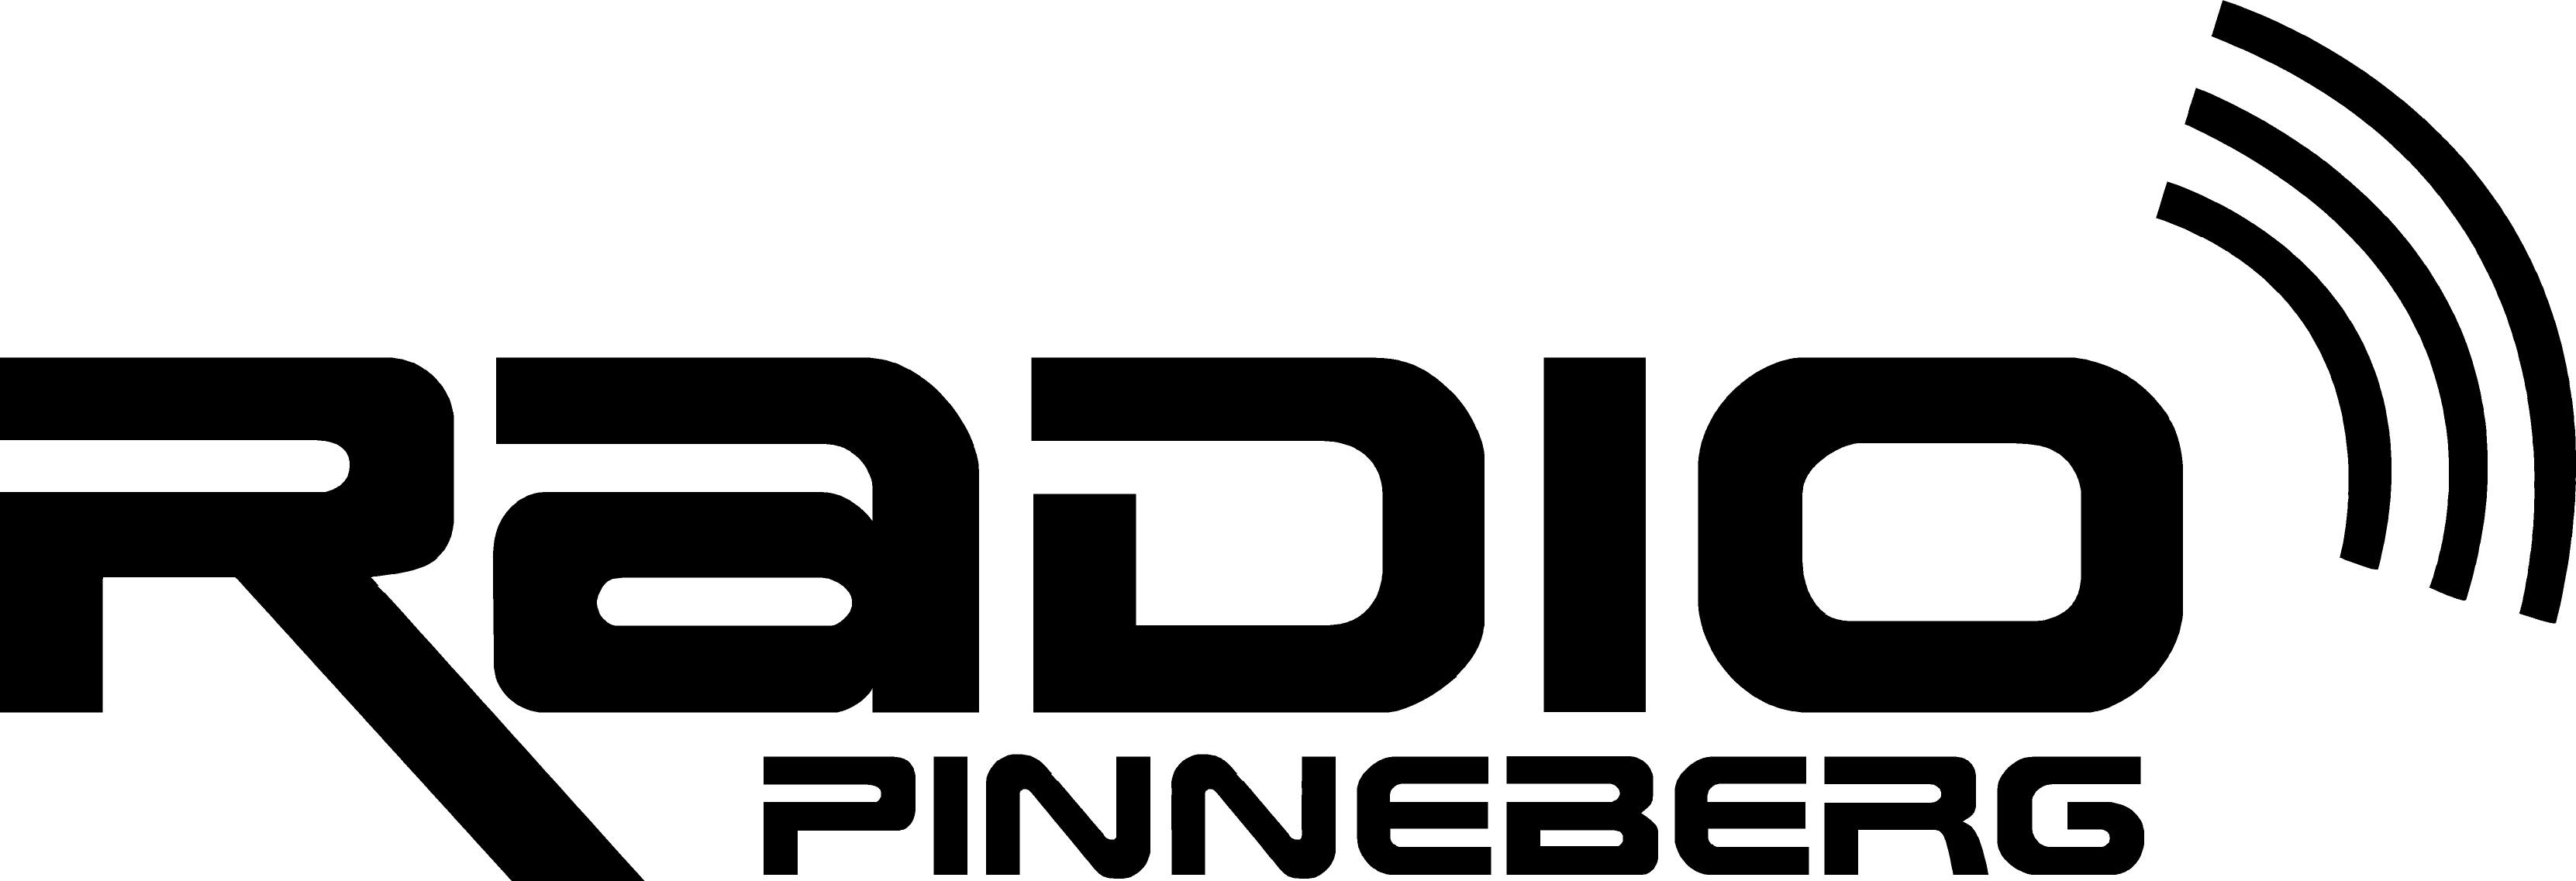 Pinneberg Radio Logo Wallpaper